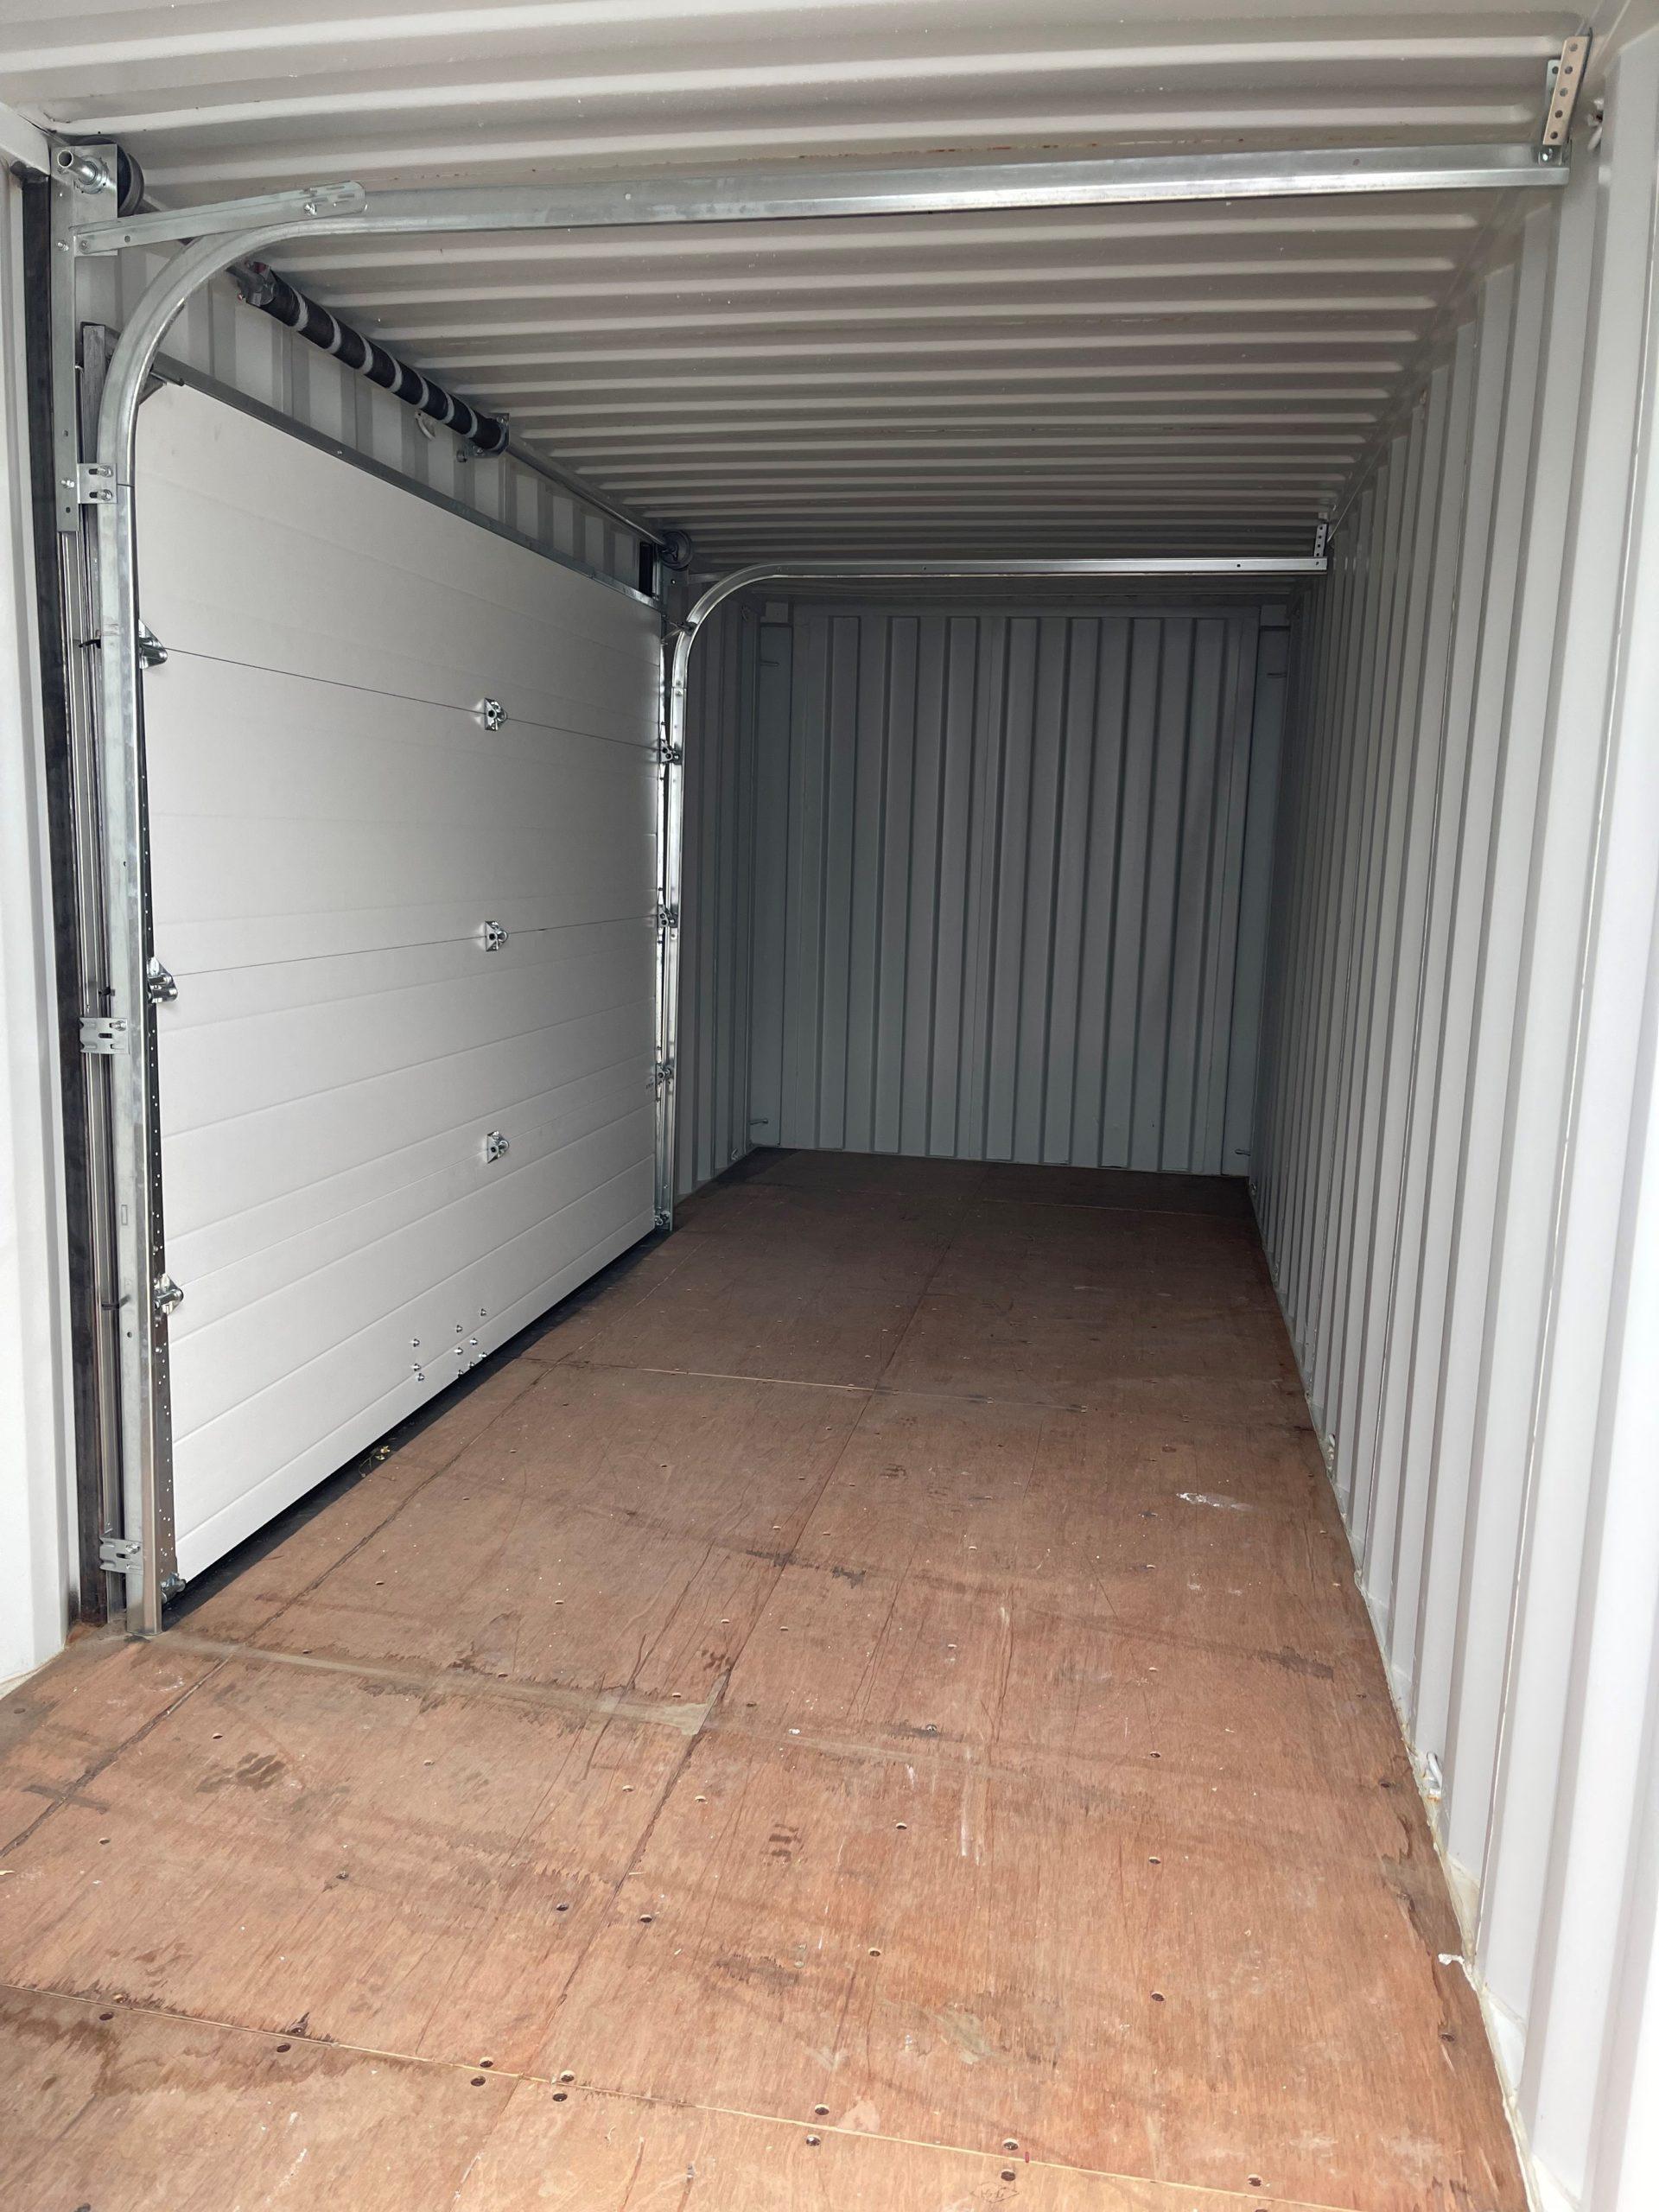 22′ STD (1-Trip) Shipping Container Overhead Door - Custom Cubes